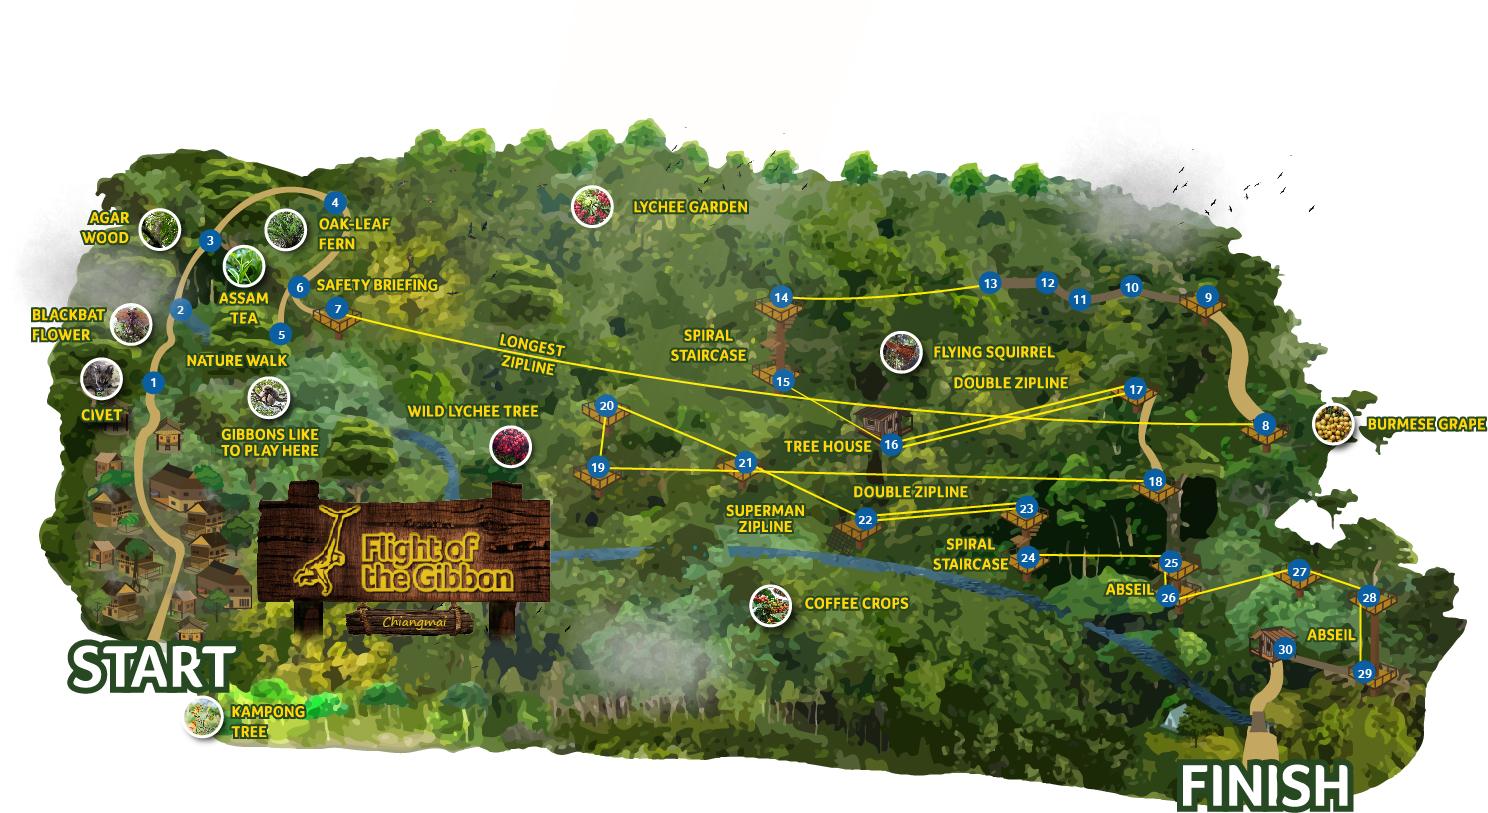 Map longest zipline chiang mai